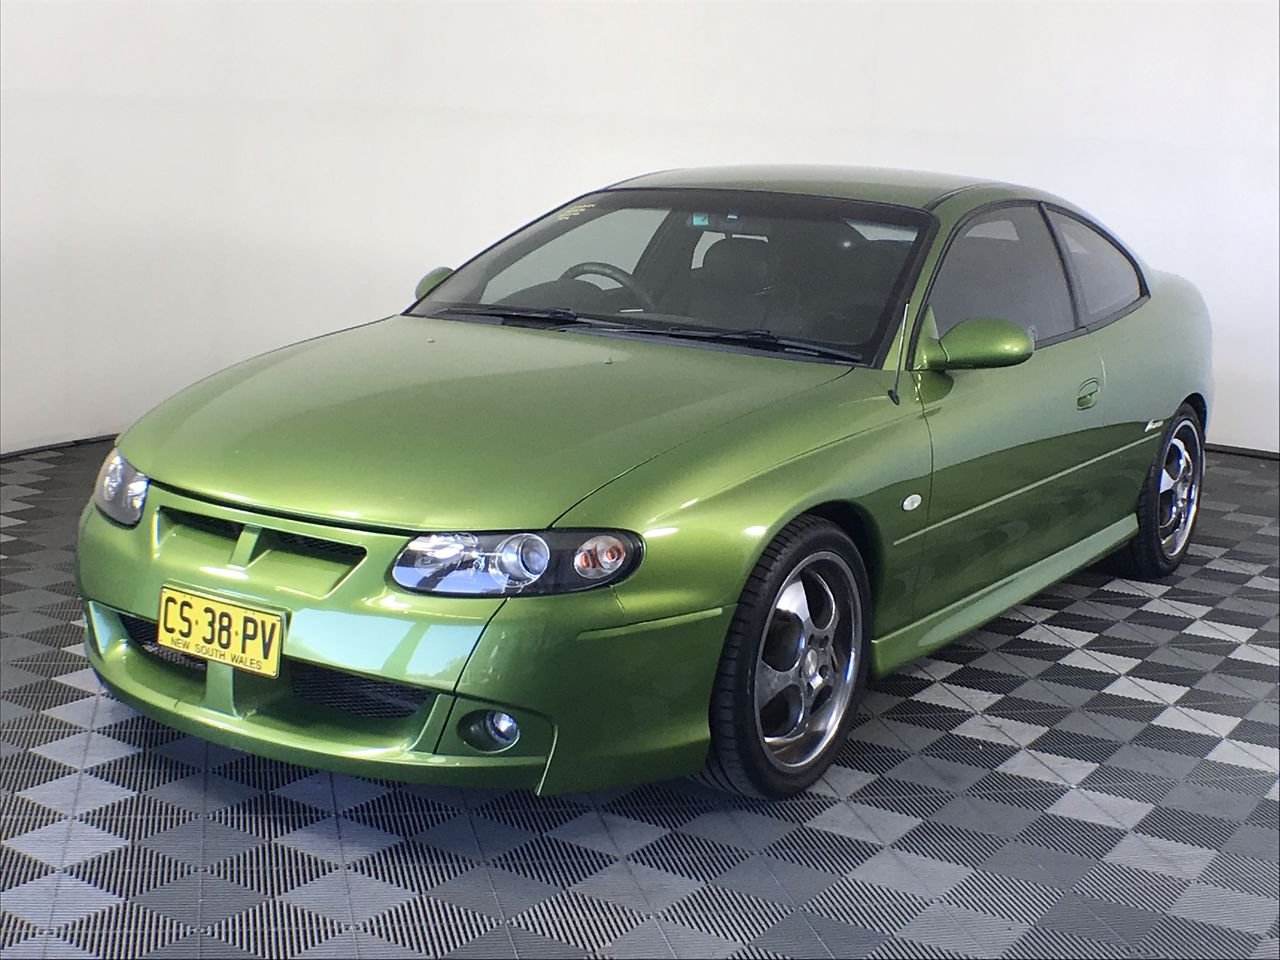 2003 Holden Monaro CV8 V2 SERIES III Automatic Coupe